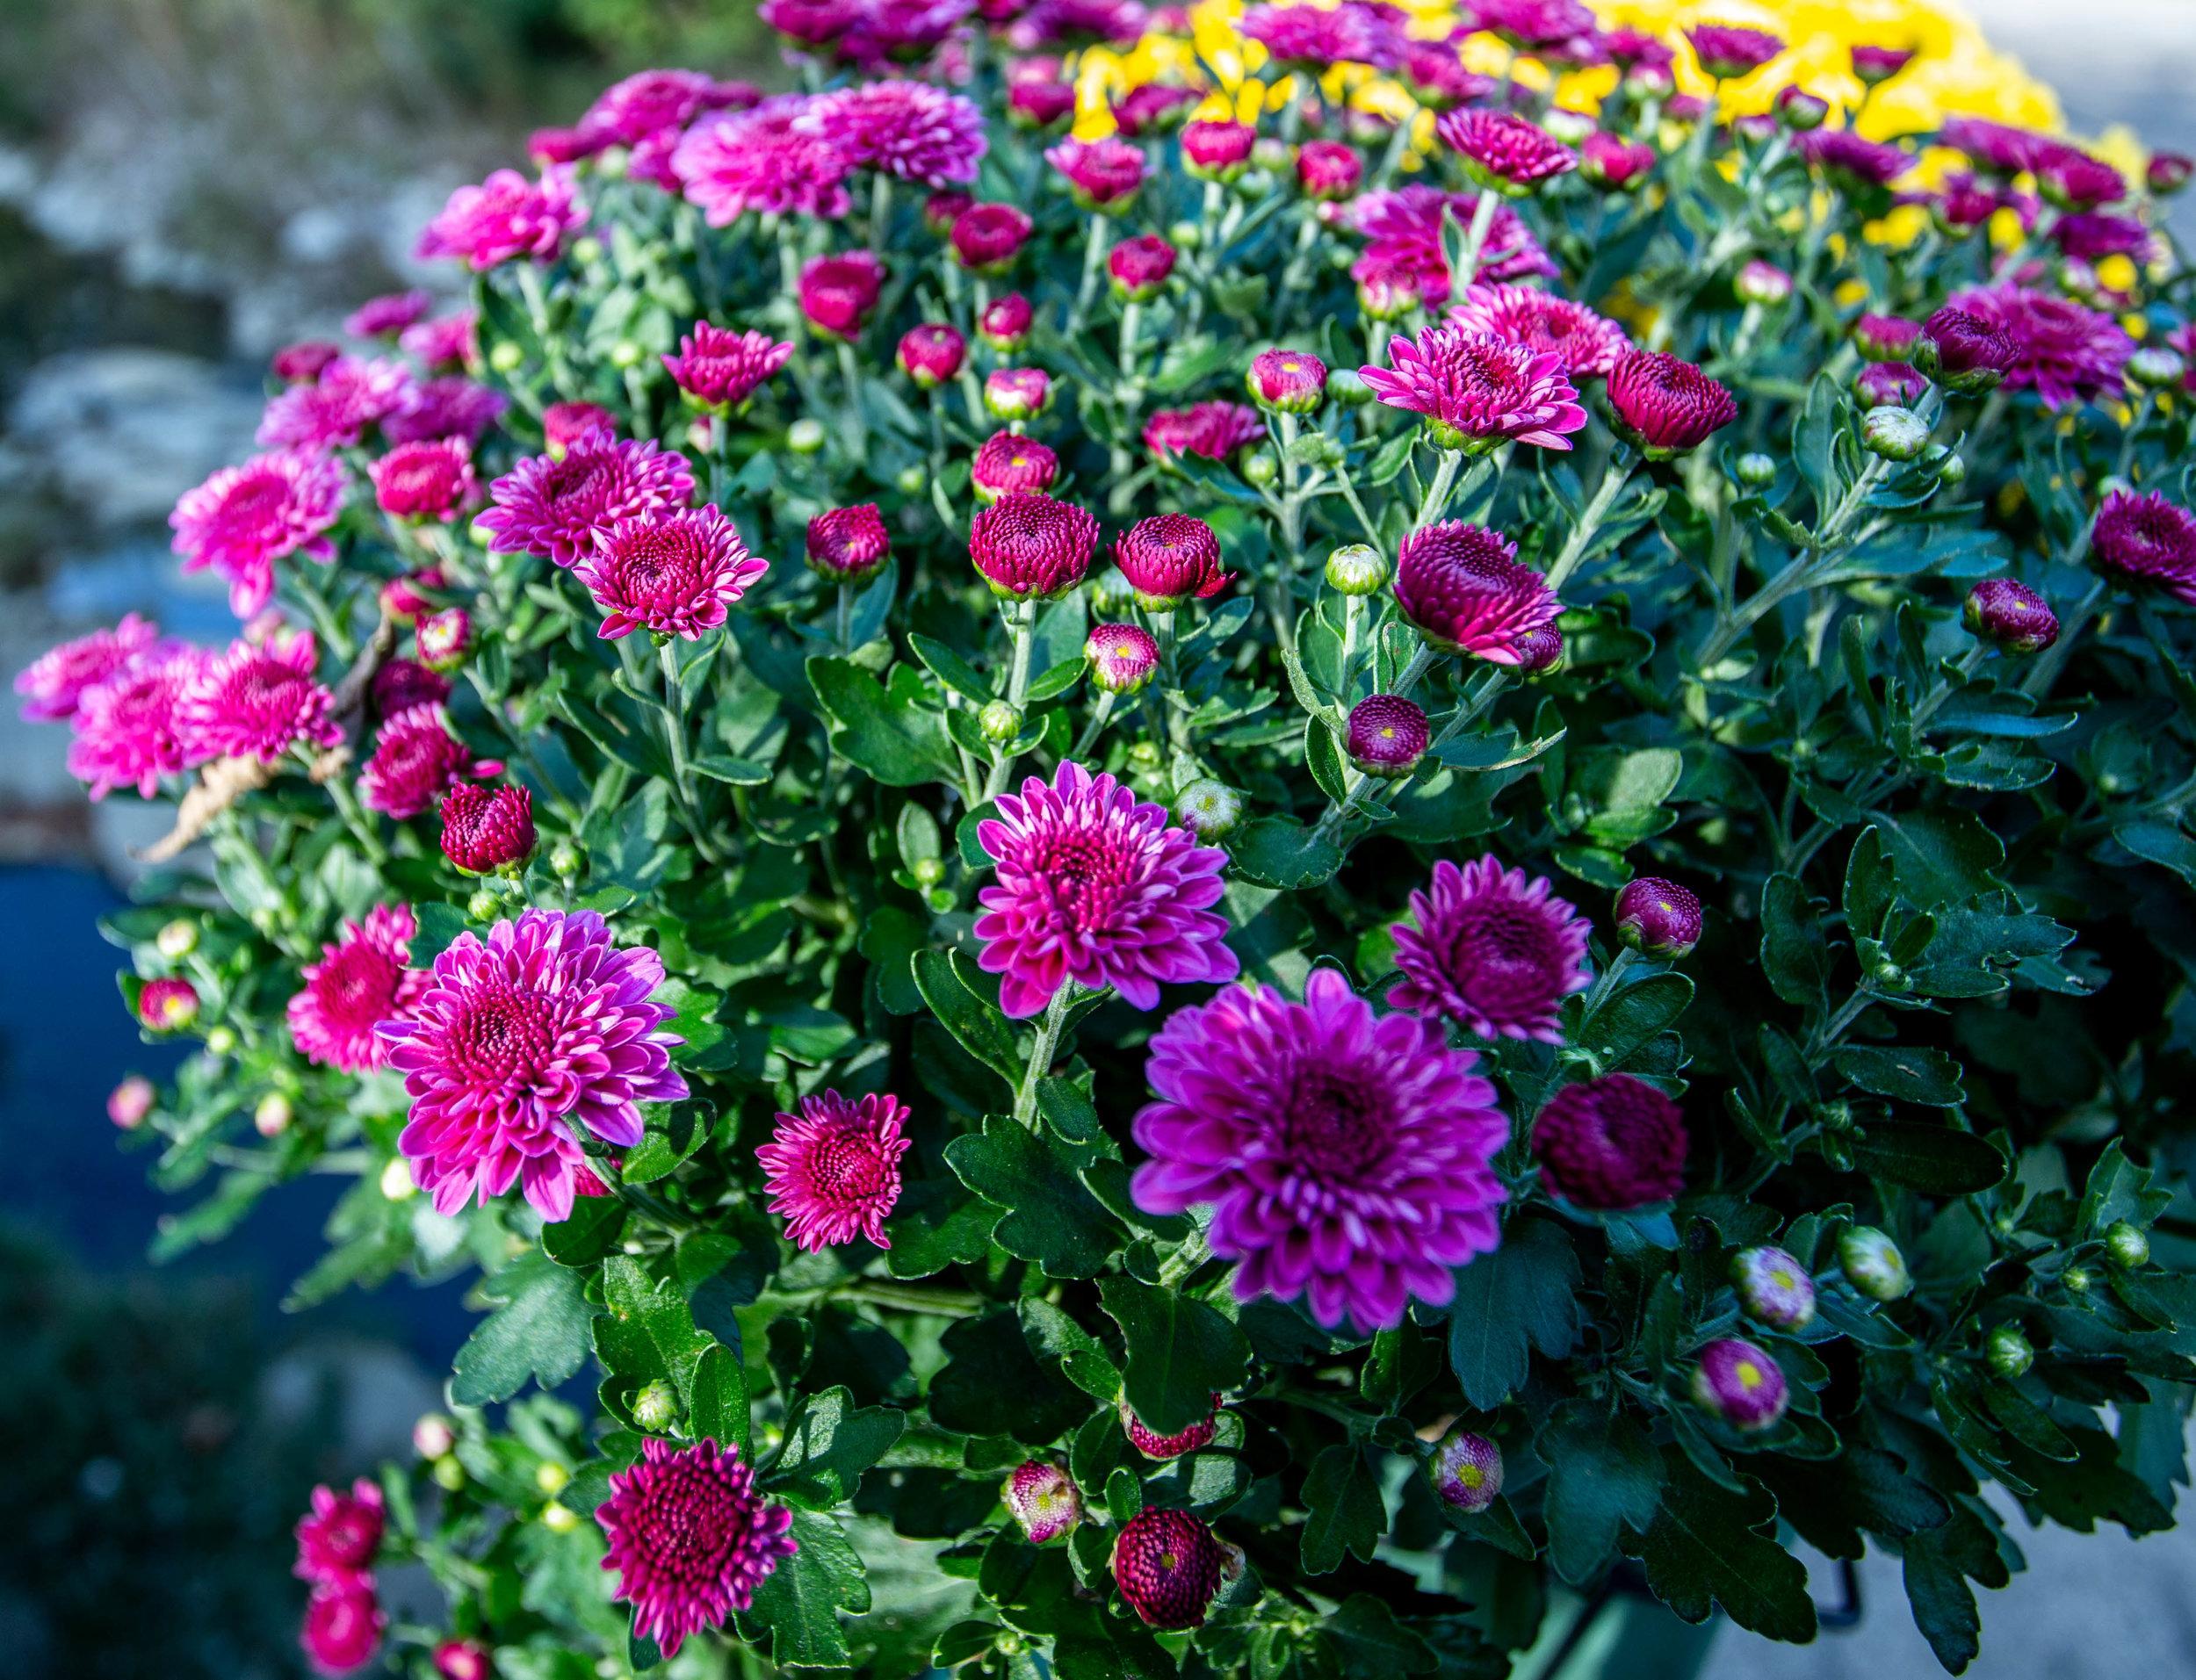 flowers closeup-1143.jpg